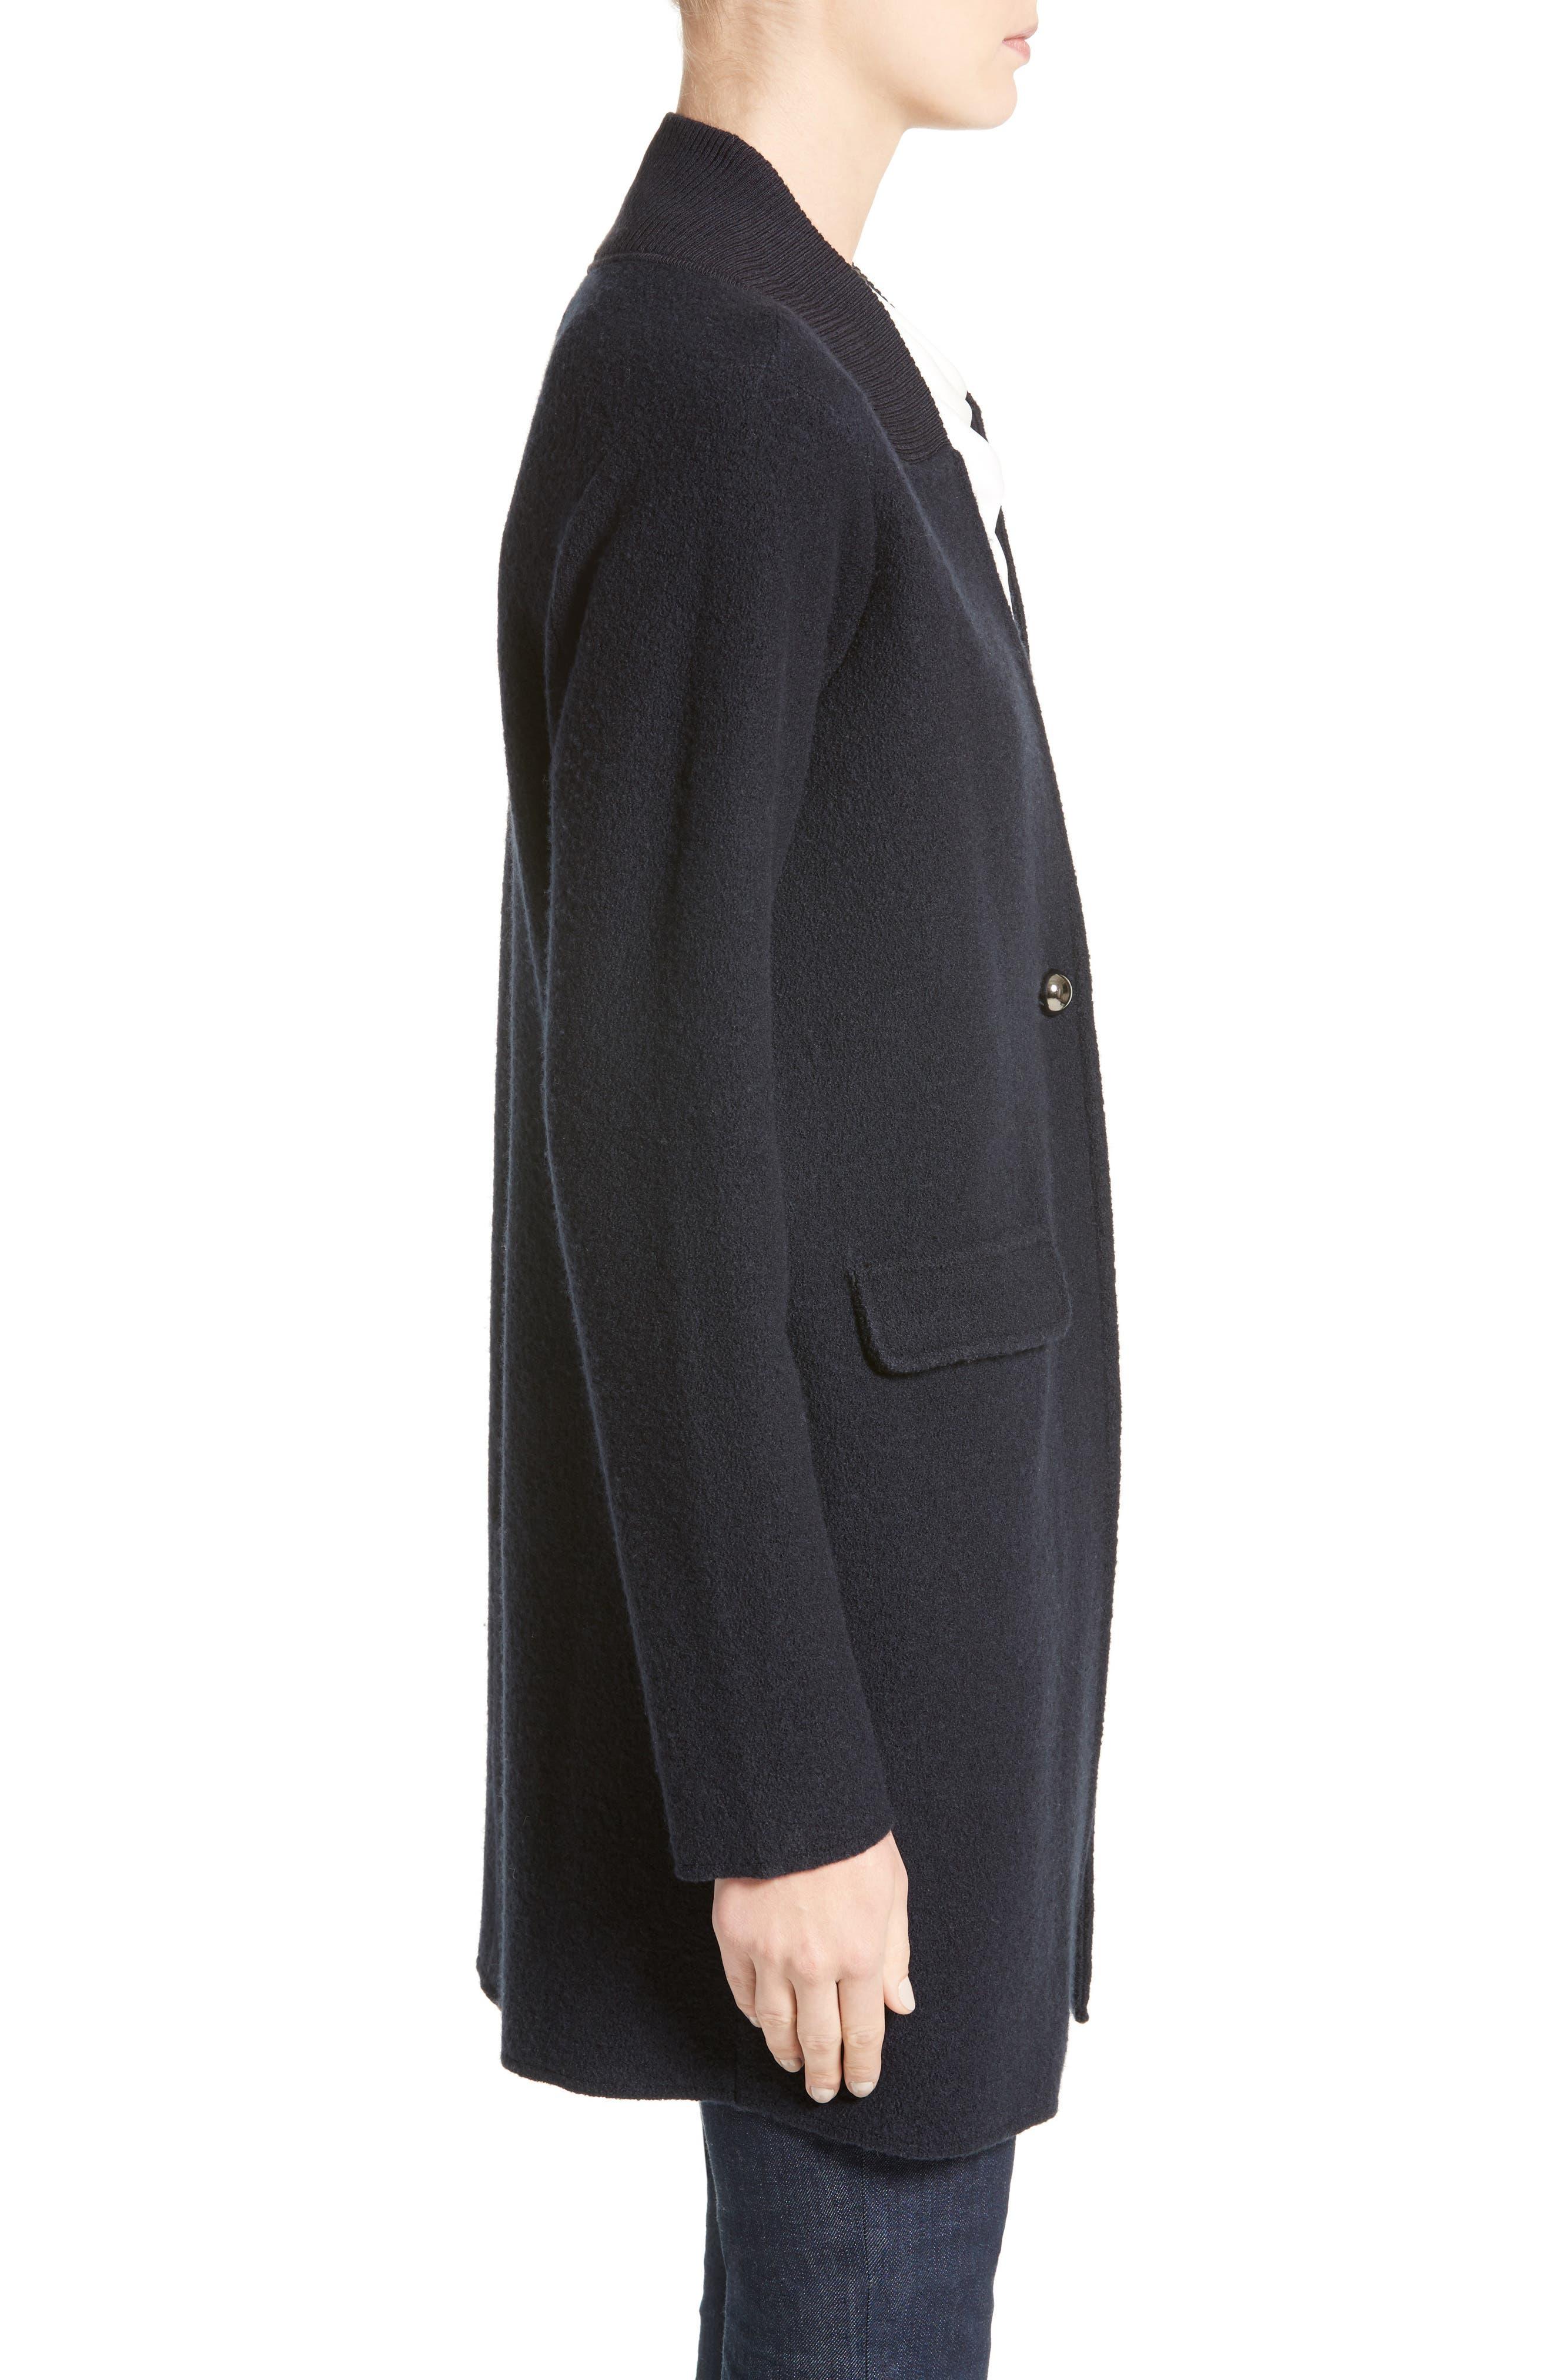 Armani Jeans Single Button Wool Coat,                             Alternate thumbnail 3, color,                             484